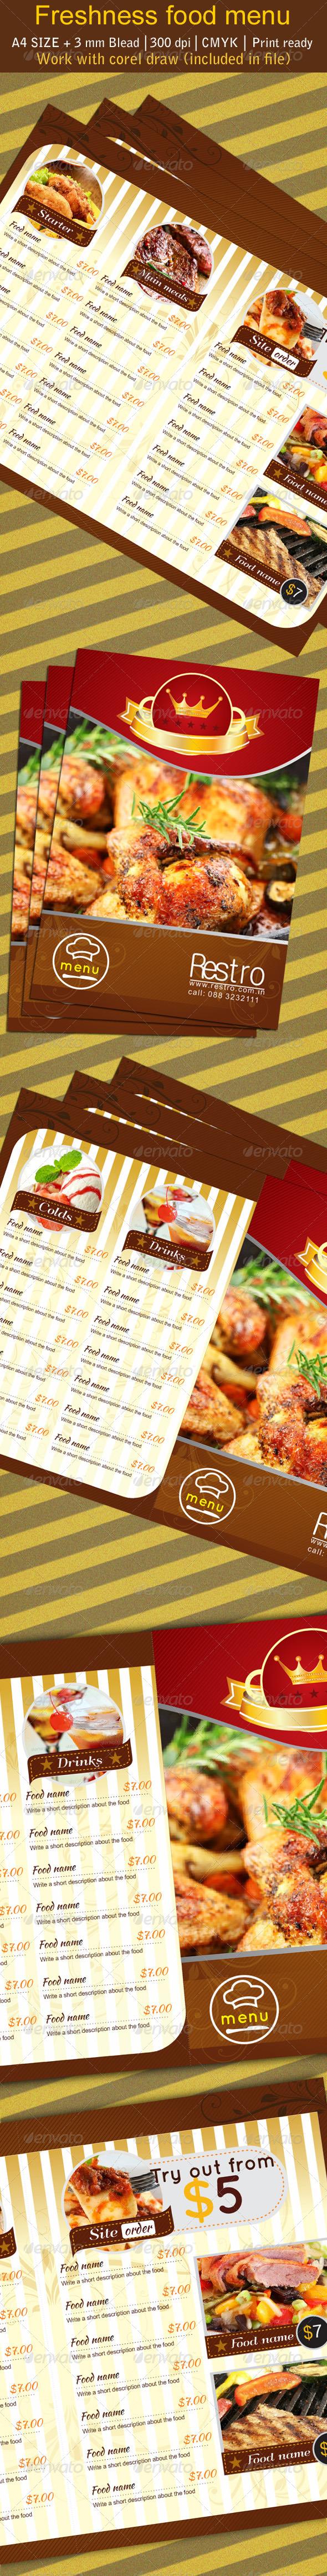 Freshness Restaurant Manu - Food Menus Print Templates